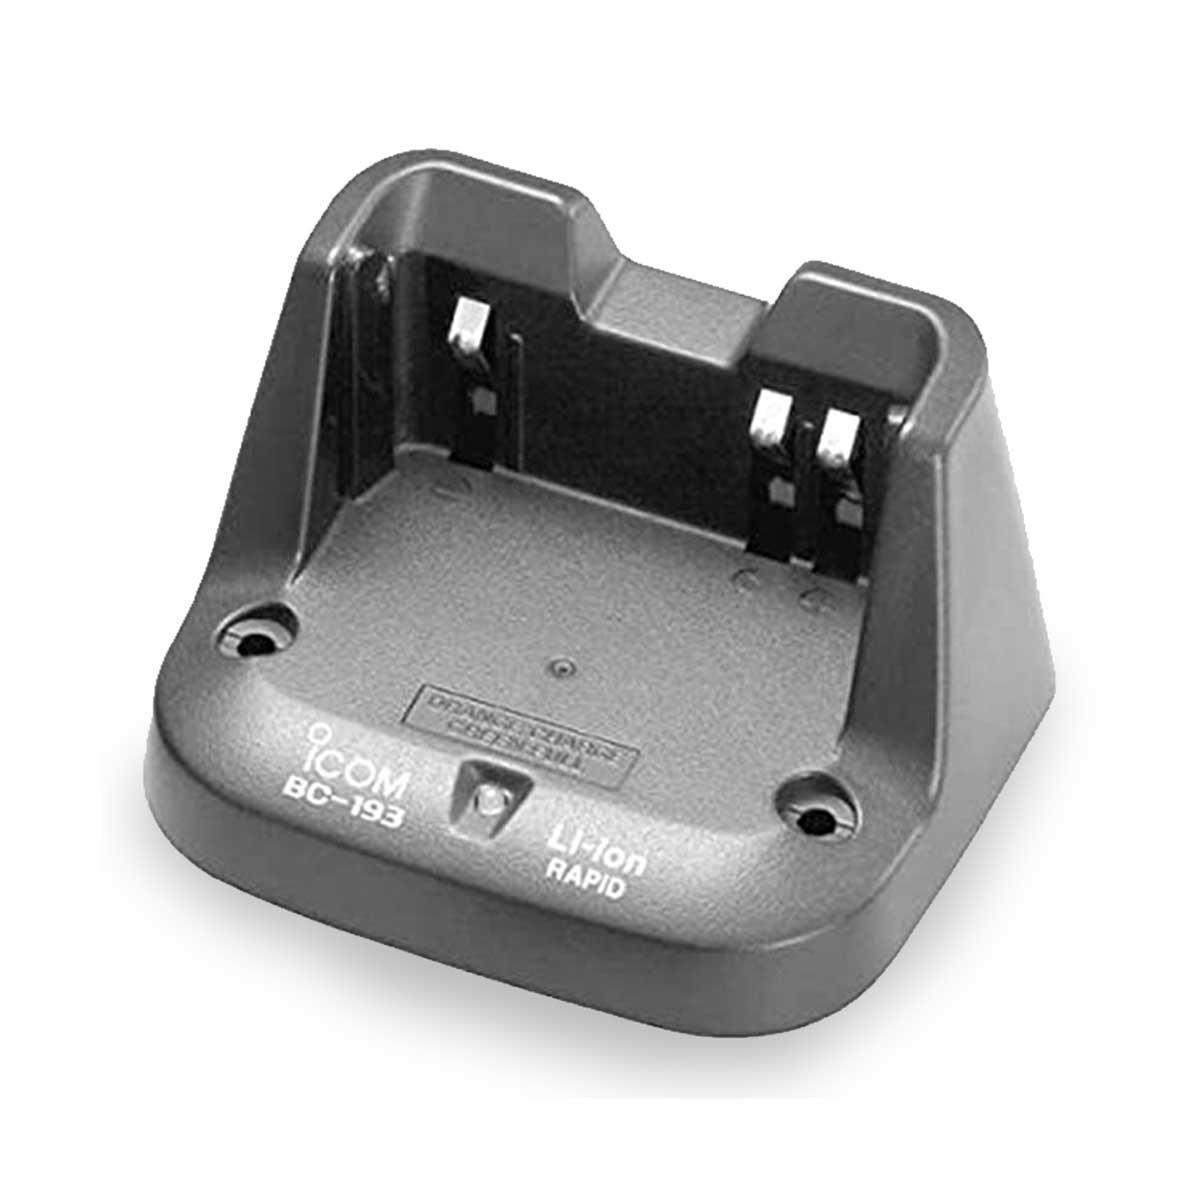 Cargador individual Icom BC-193 para radio IC-F4003